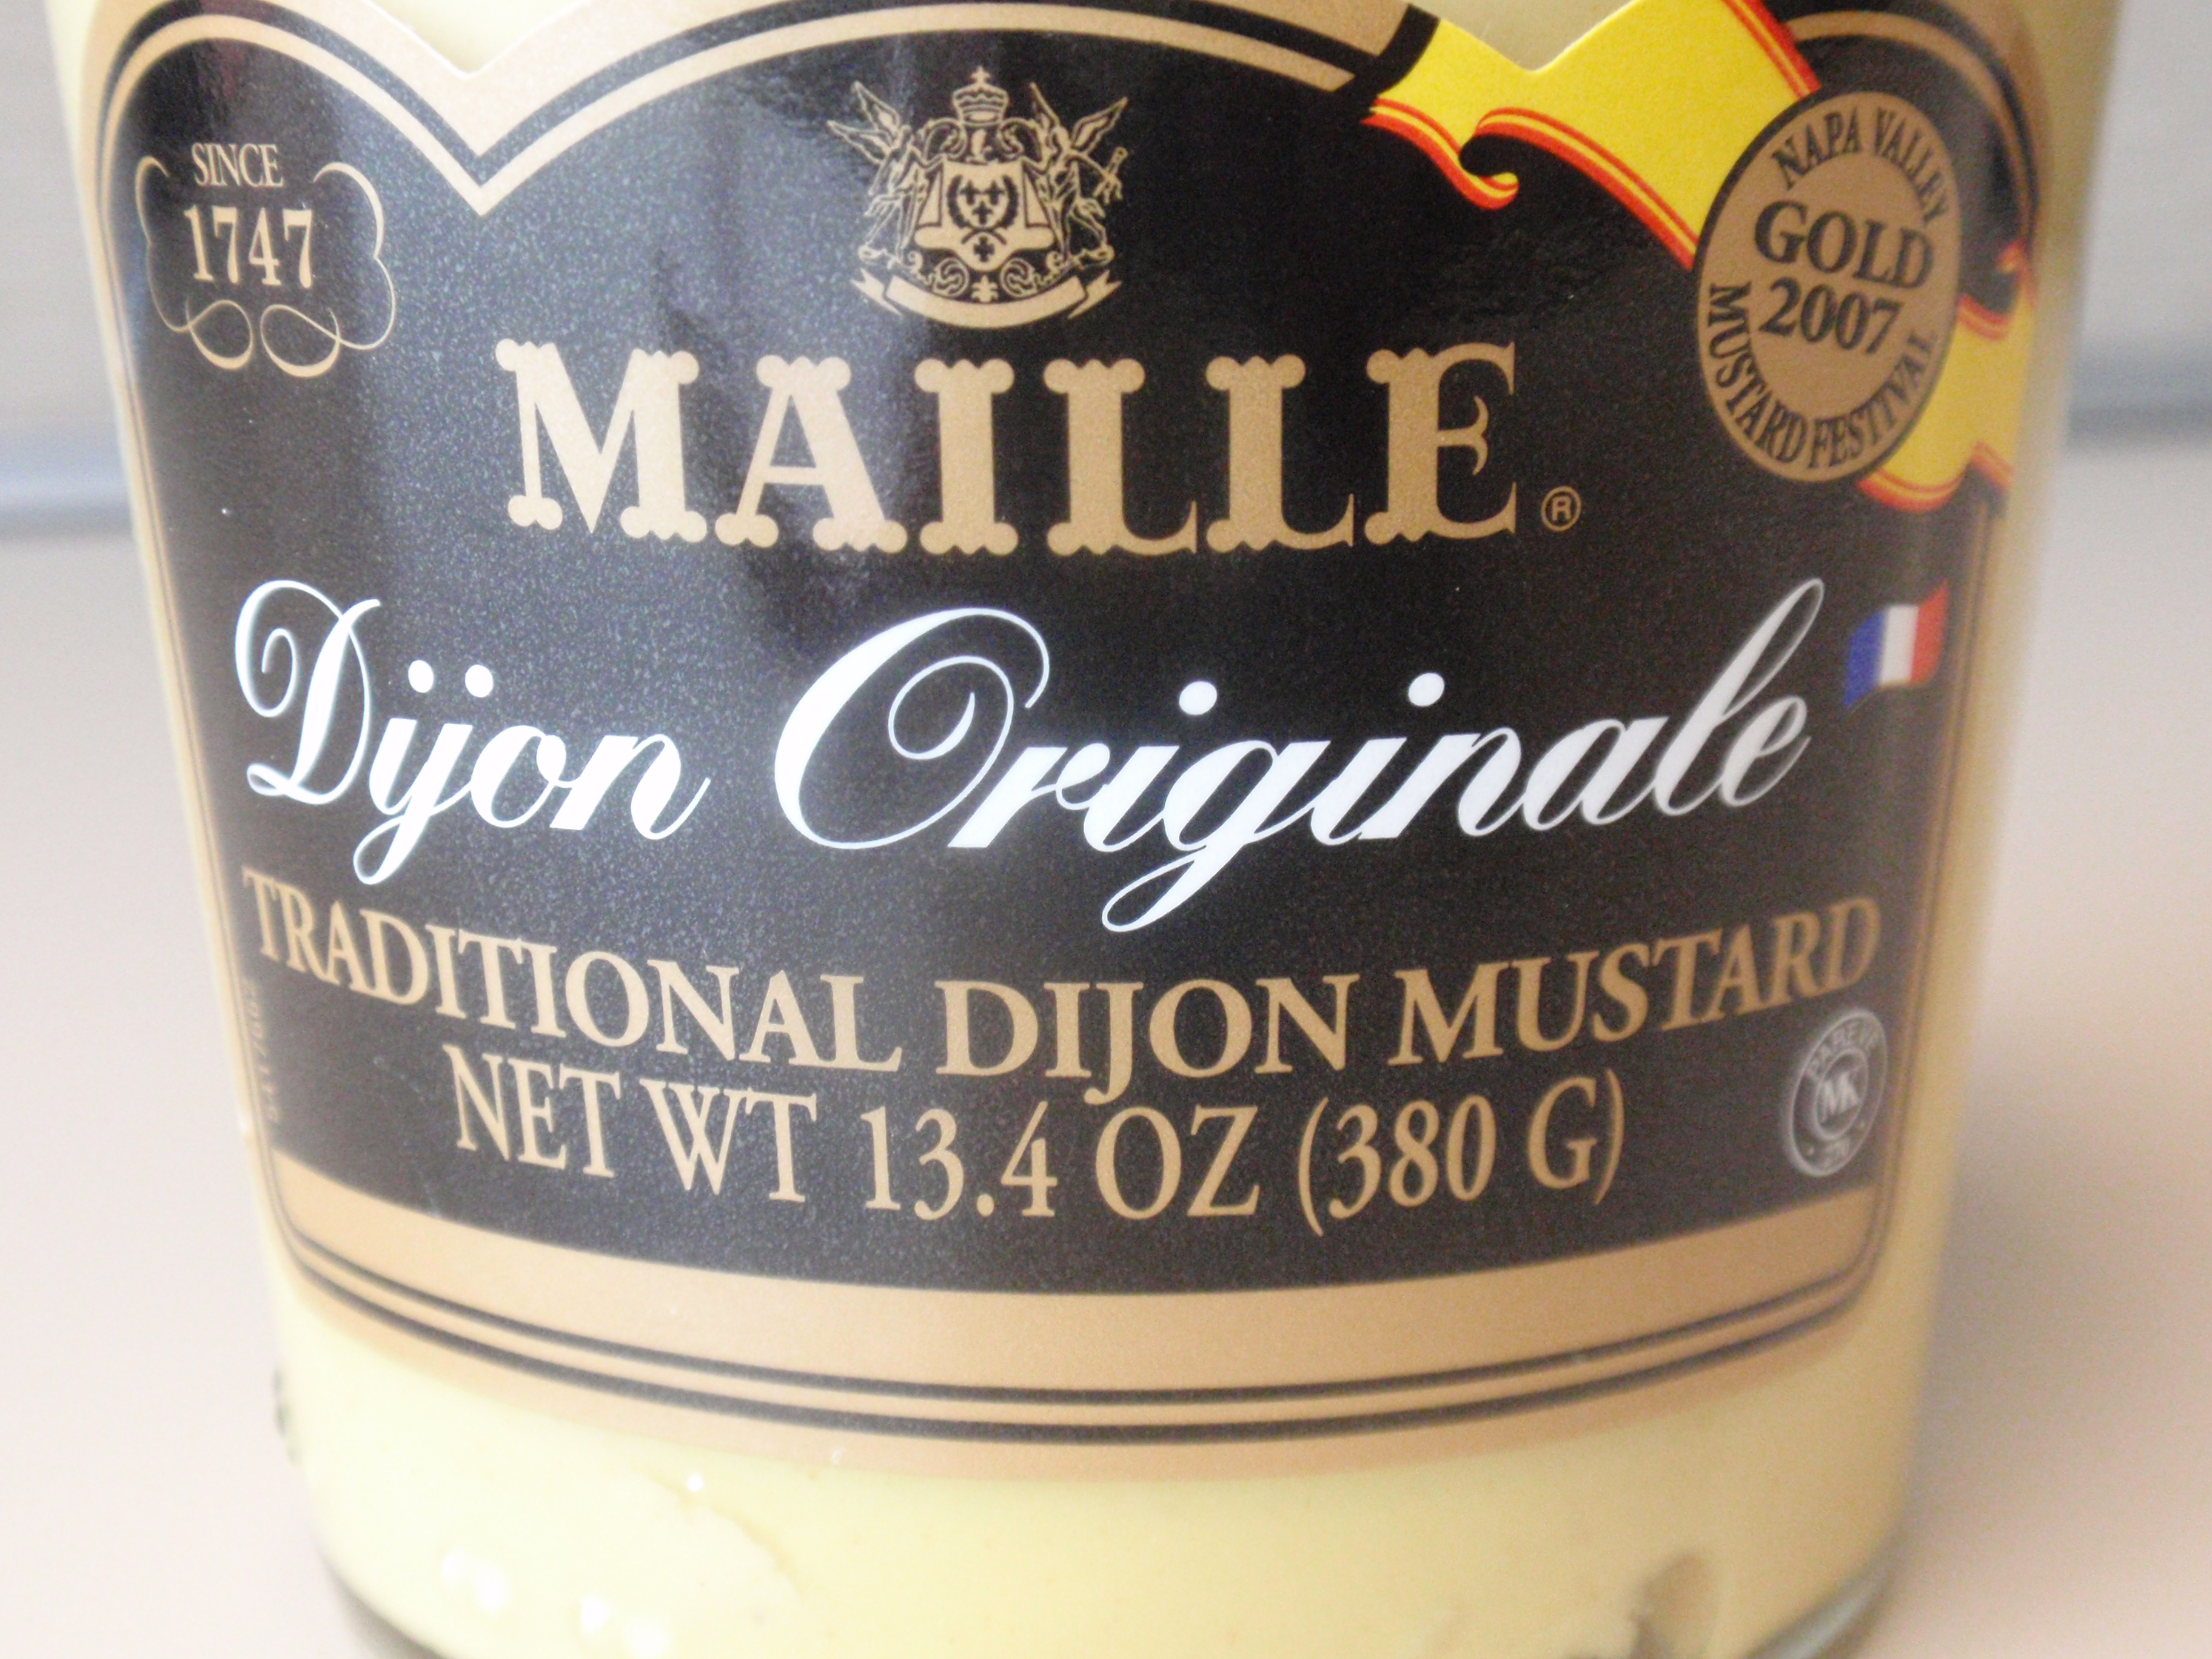 Hands down the best Dijon Mustard!  Originally $10, I got mine for $2.50!